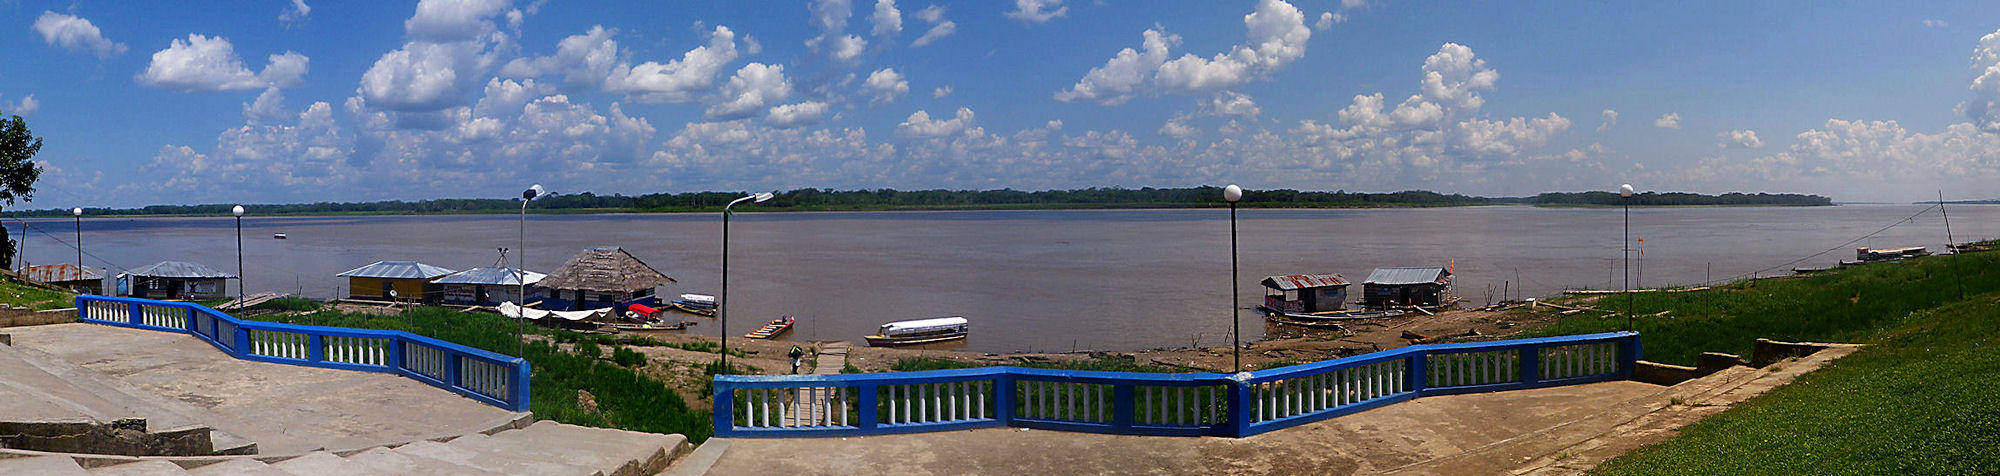 Amazonas bei Baradero